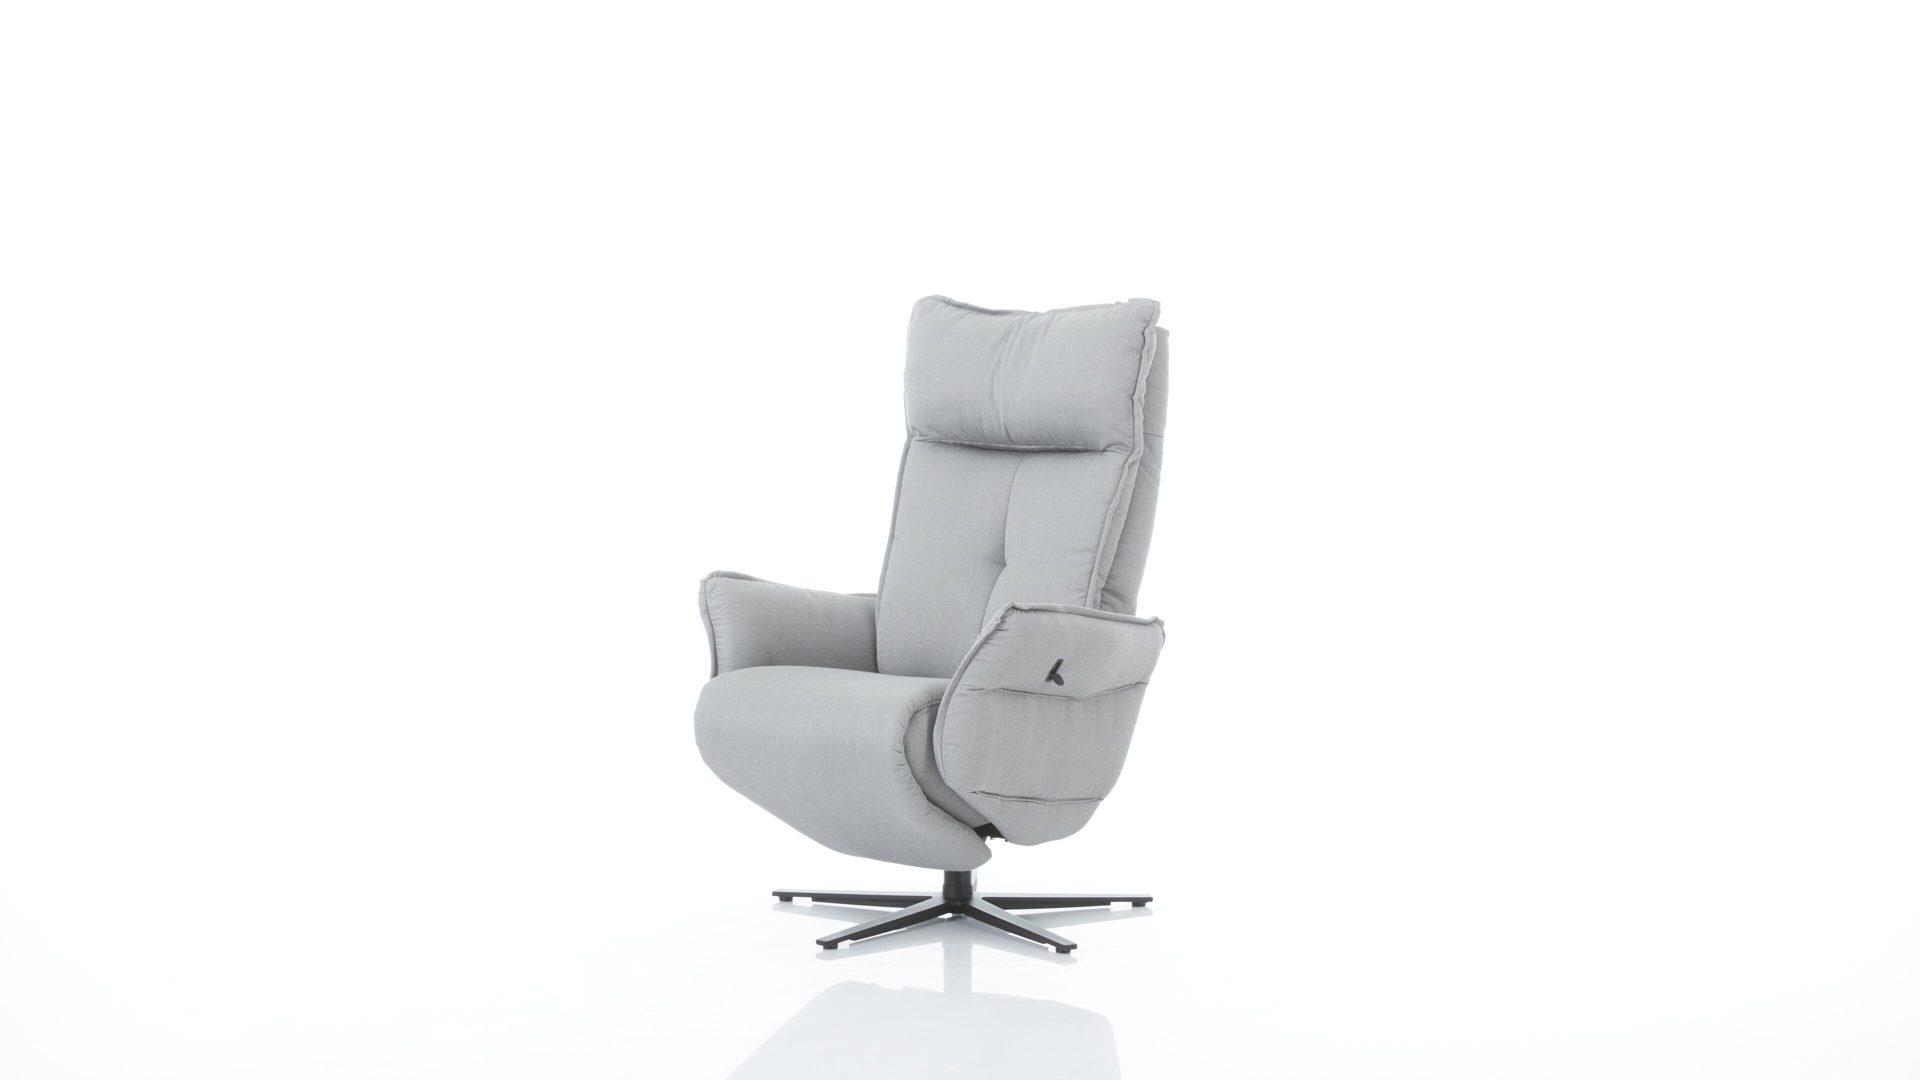 Interliving Sessel Serie 4500 Easy Swing Sessel Hellgrauer Bezug Q2